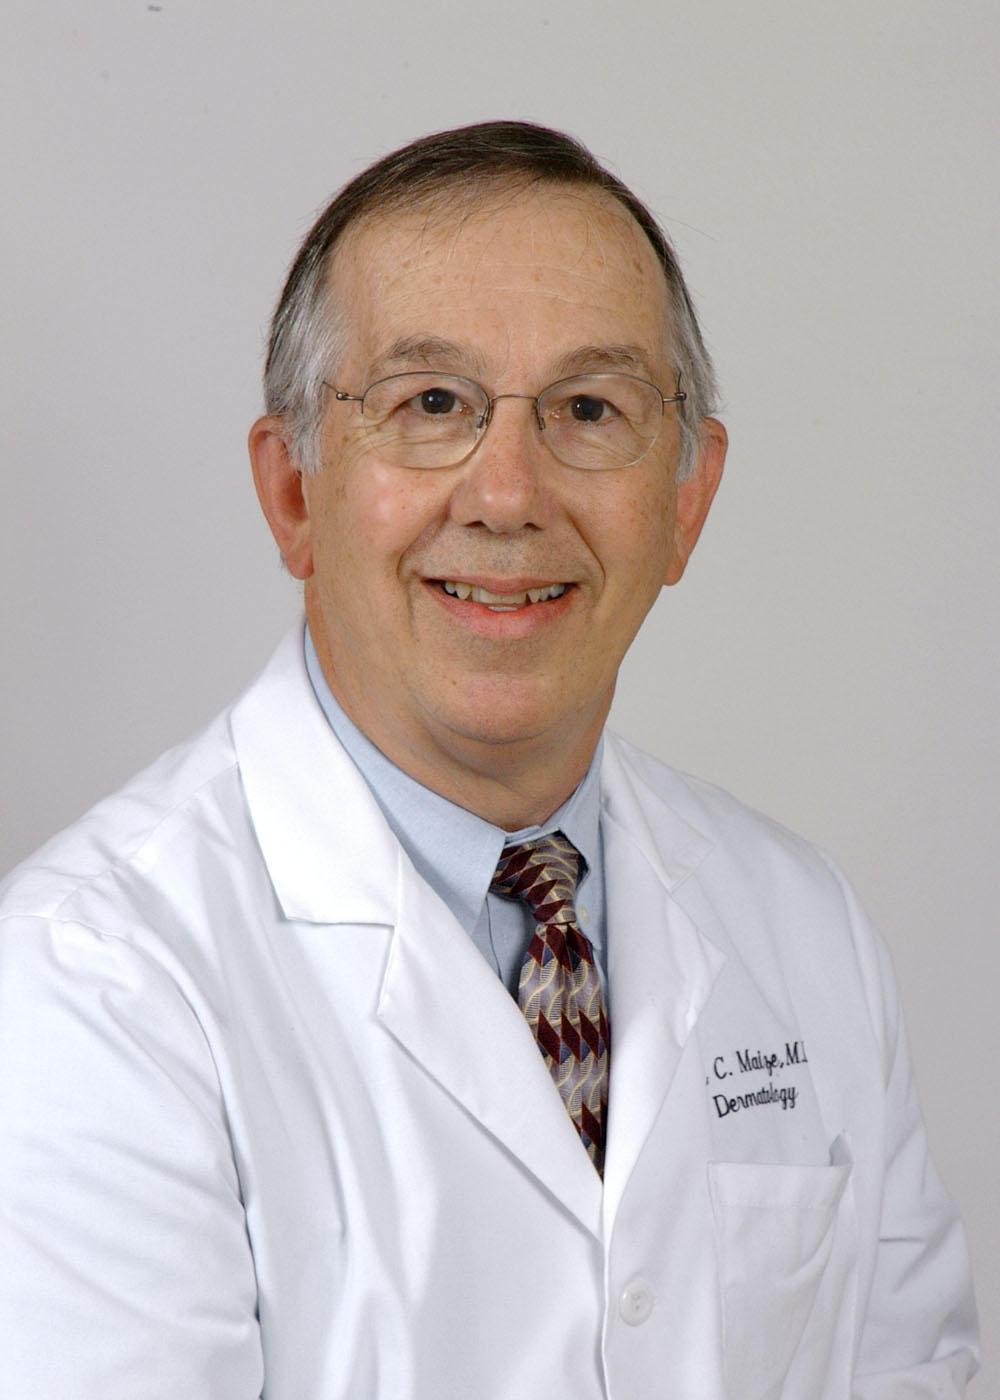 John C Maize, Sr MD